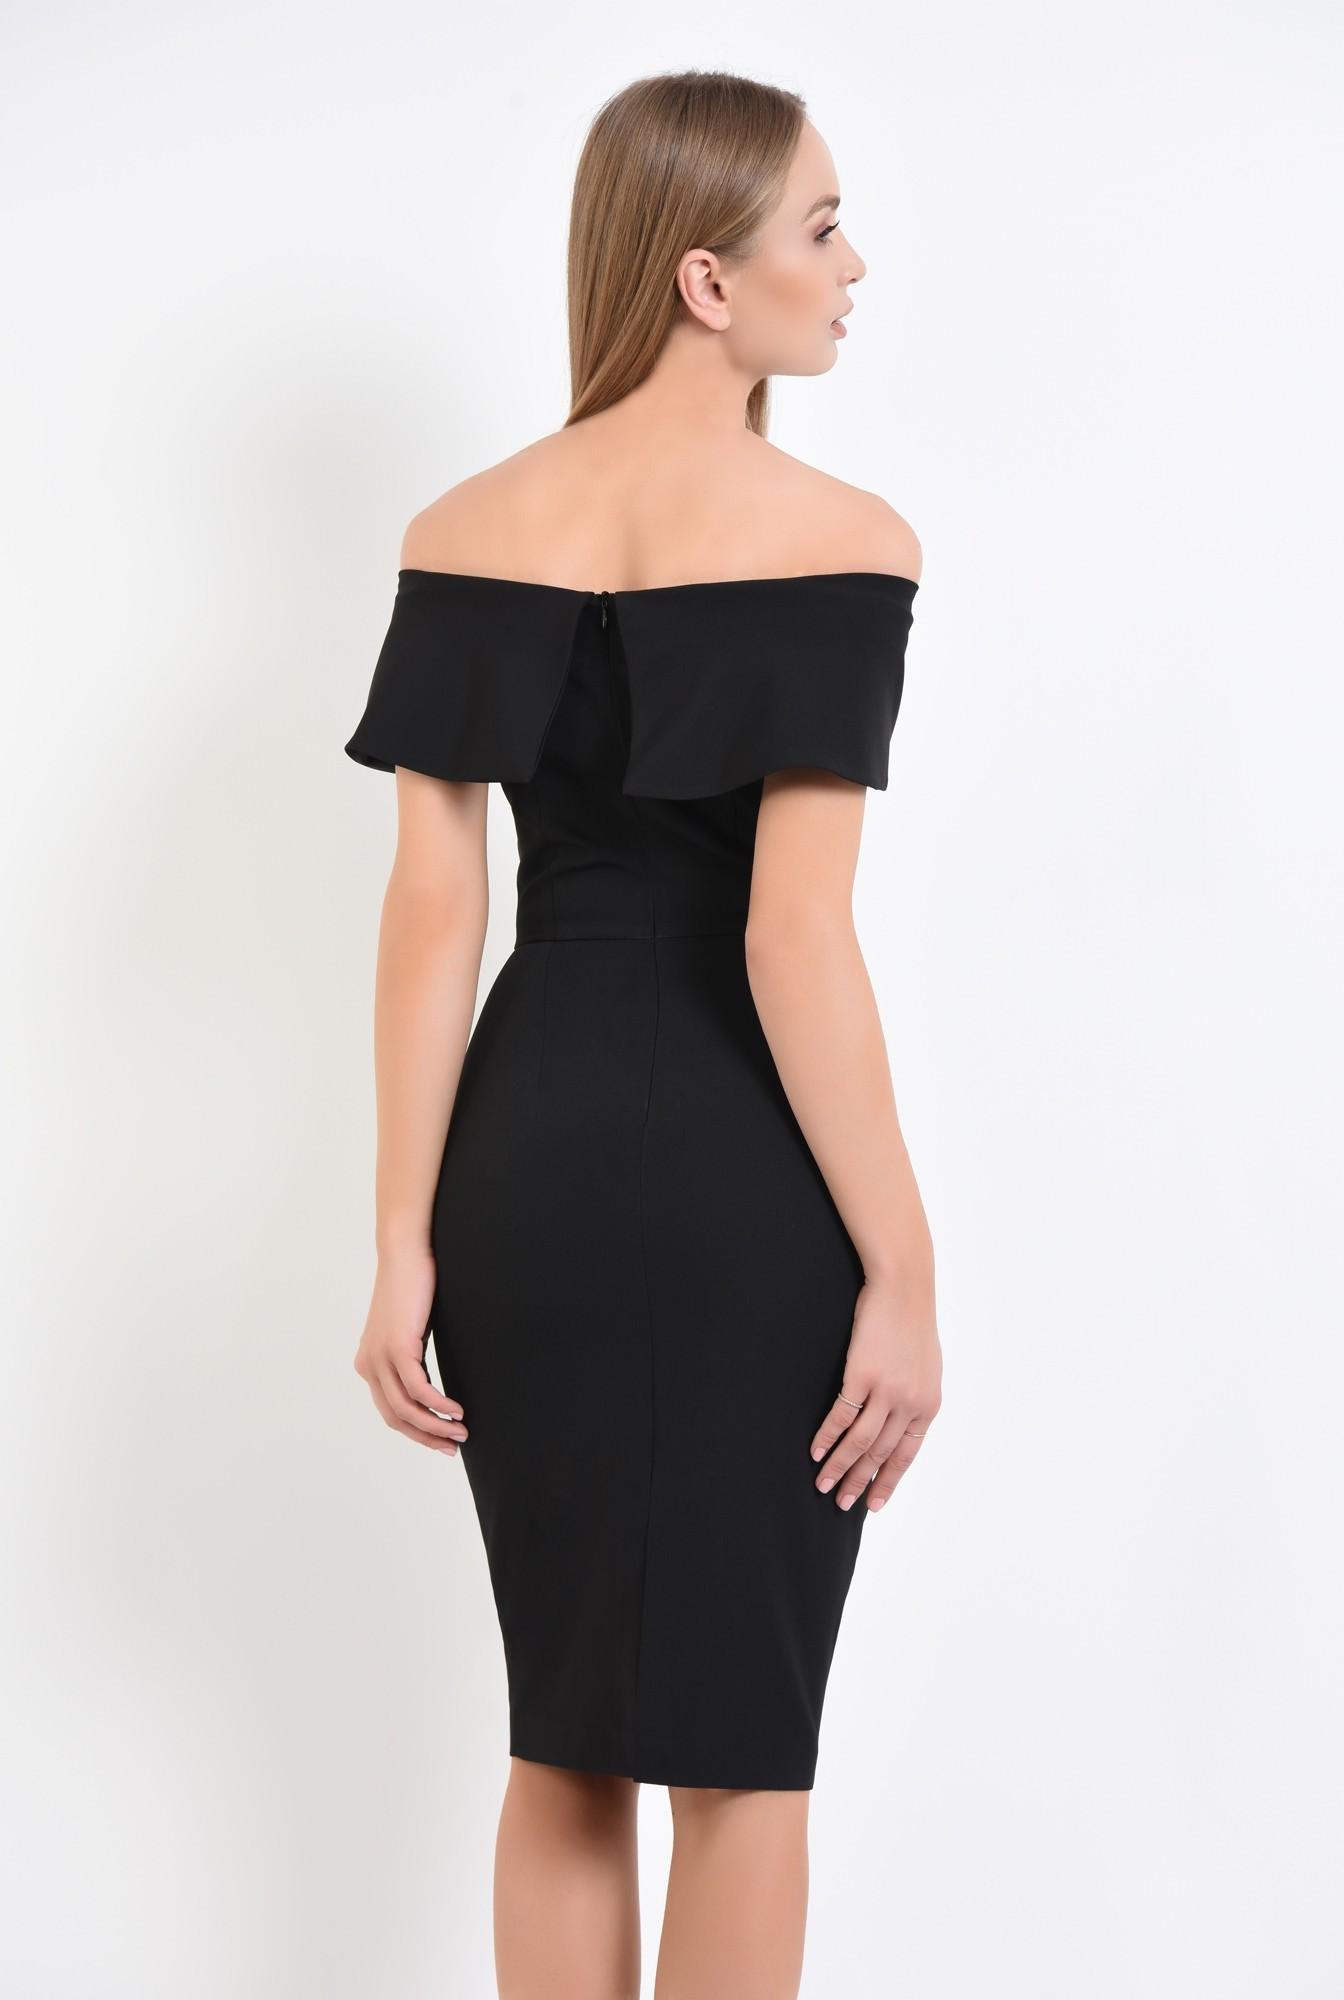 1 - rochie de seara, neagra, conica, cu funda